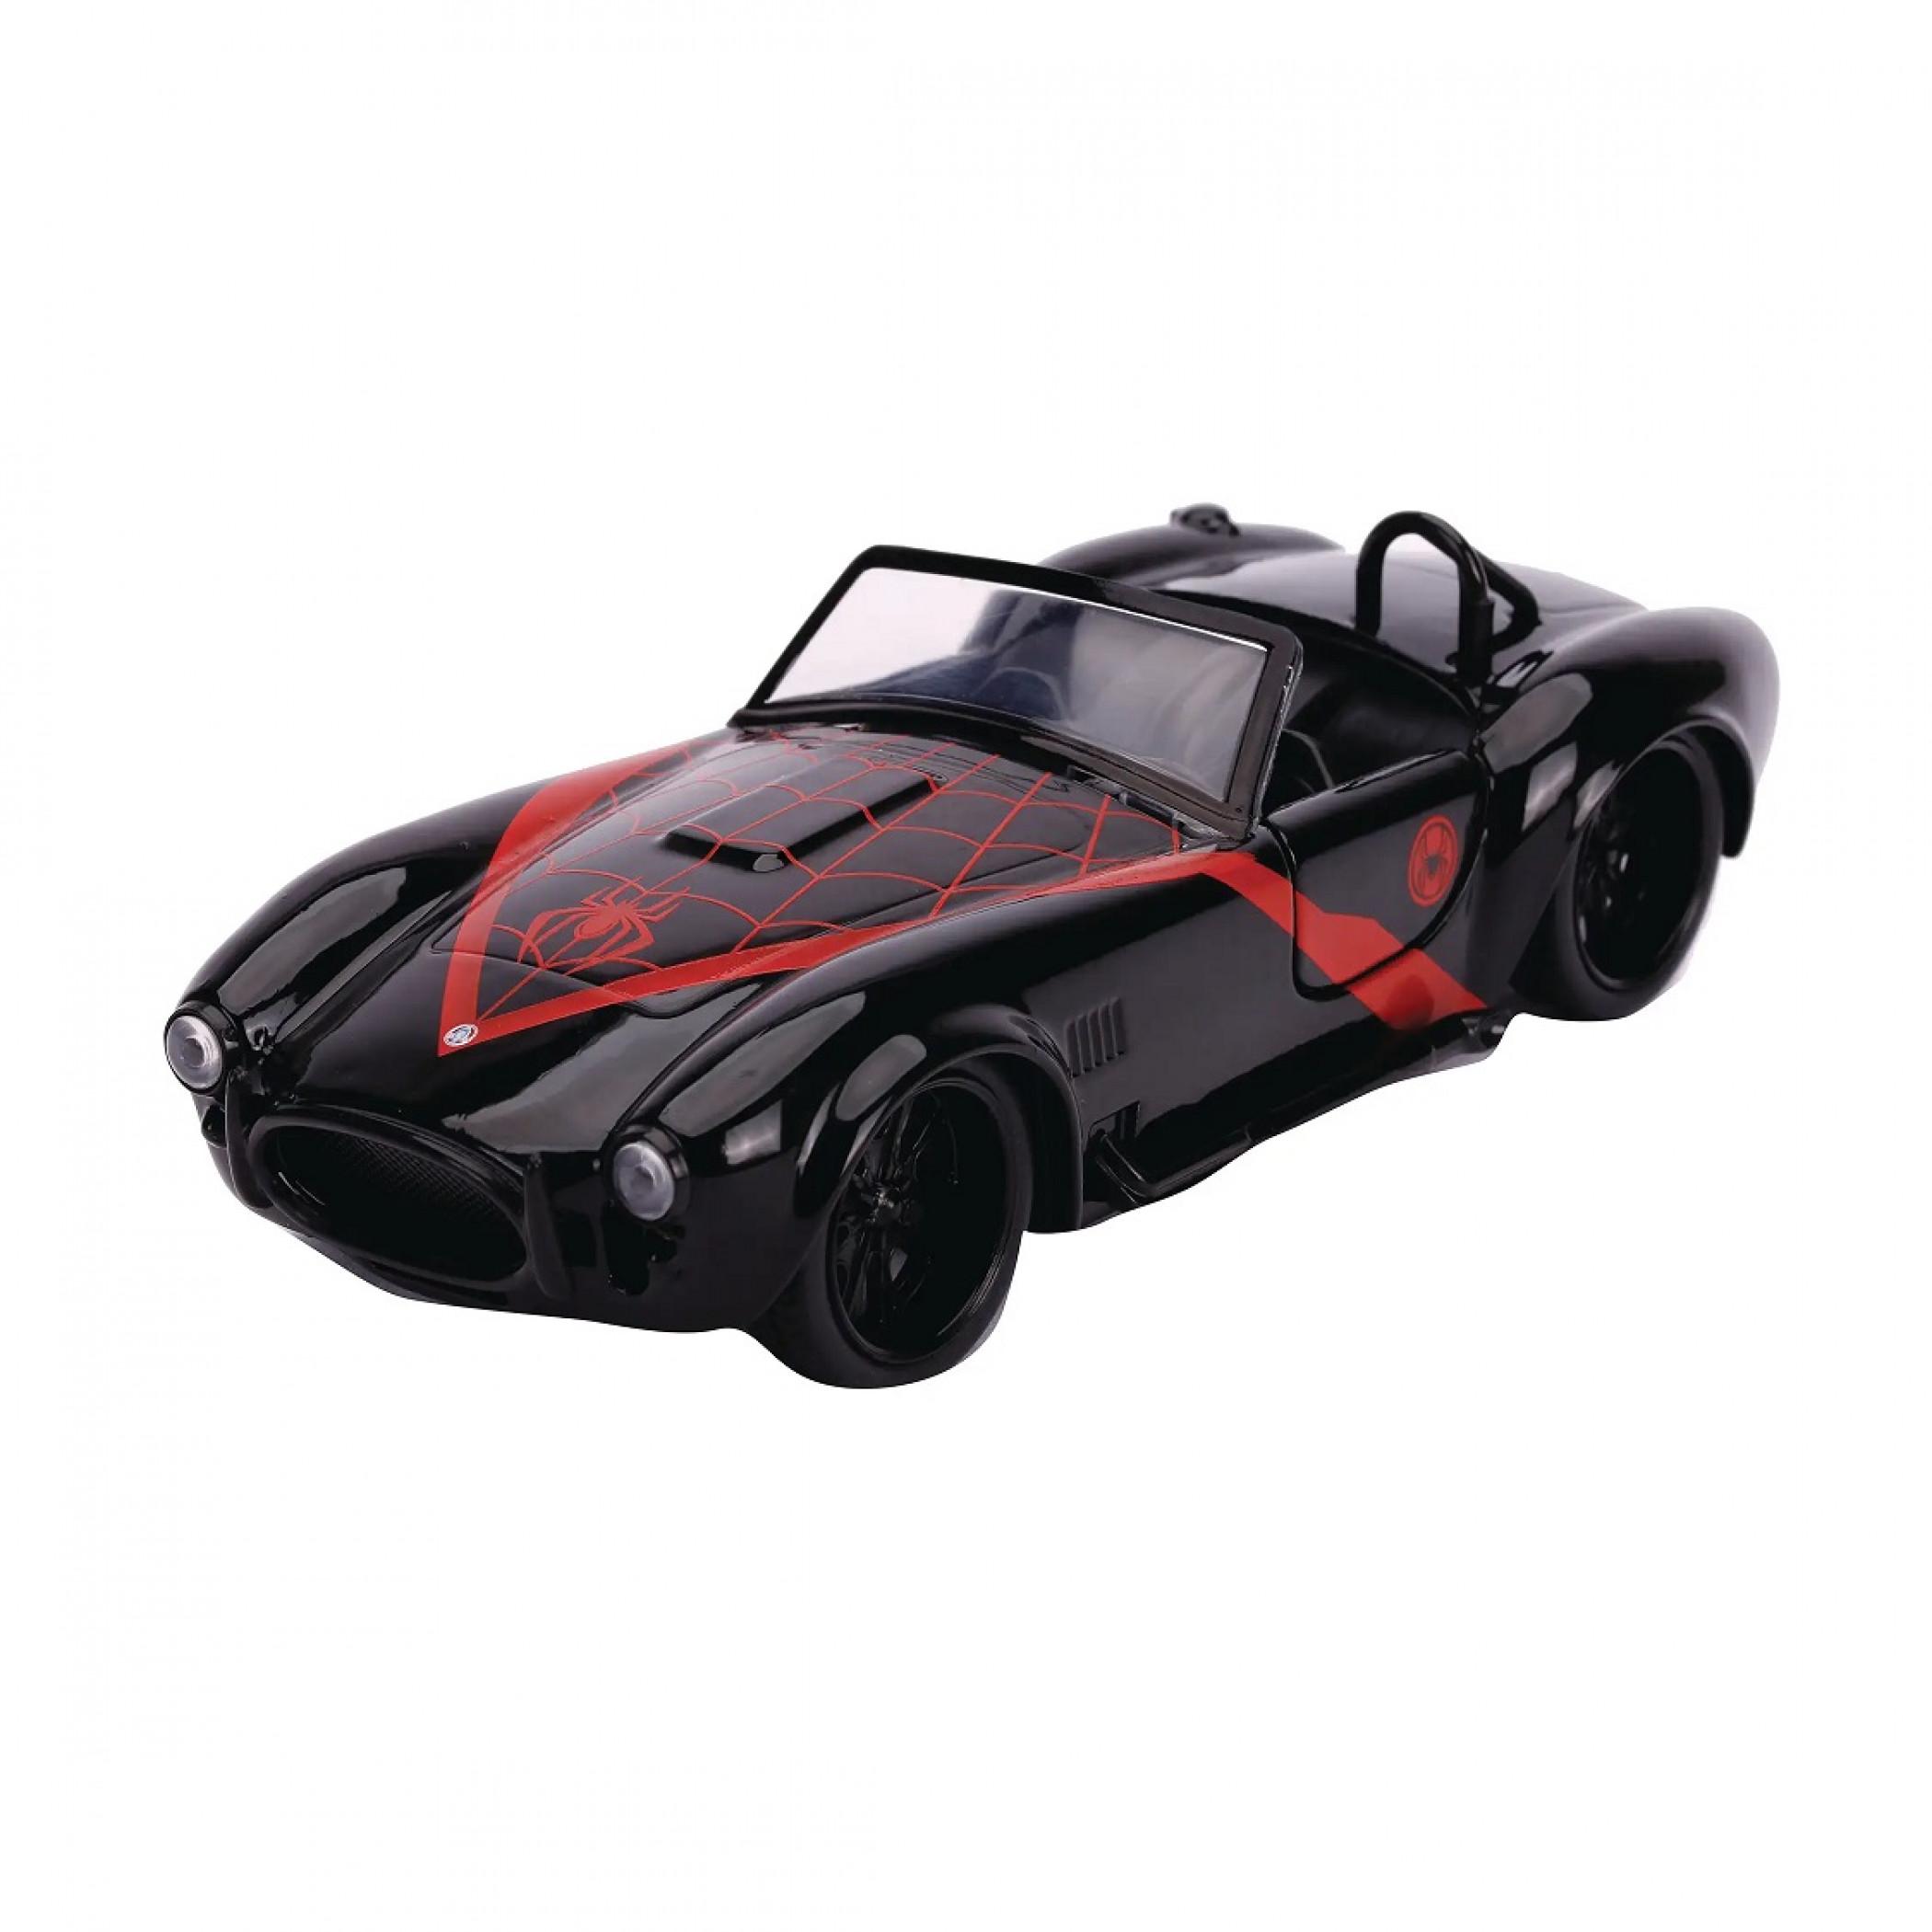 "Miles Morales 1965 Shelby Cobra 427 Diecast Metal 5"" Movie Car by Jada Toys"